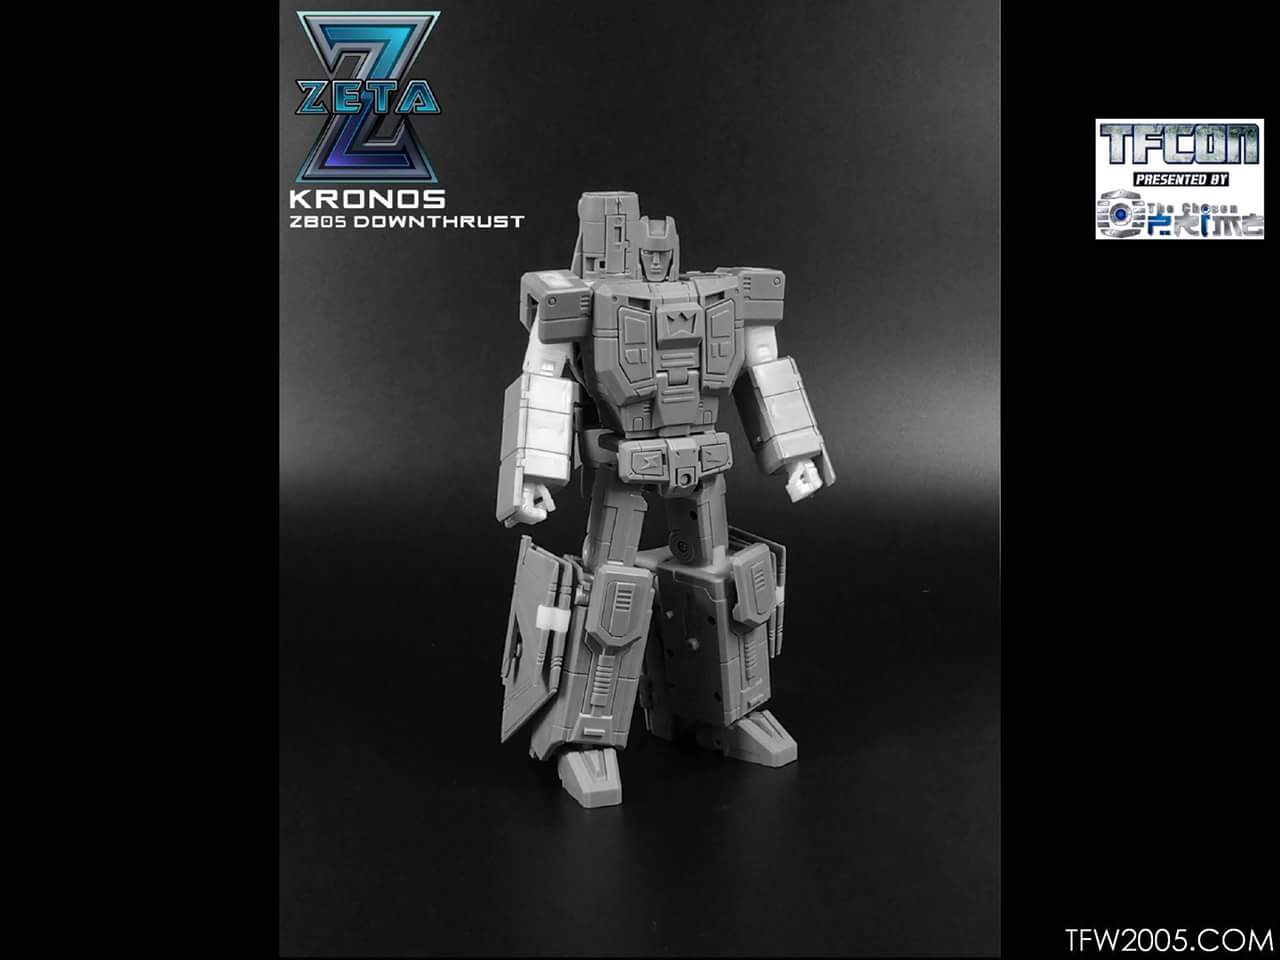 [Zeta Toys] Produit Tiers ― Kronos (ZB-01 à ZB-05) ― ZB-06|ZB-07 Superitron ― aka Superion - Page 2 L7LjoaGn_o